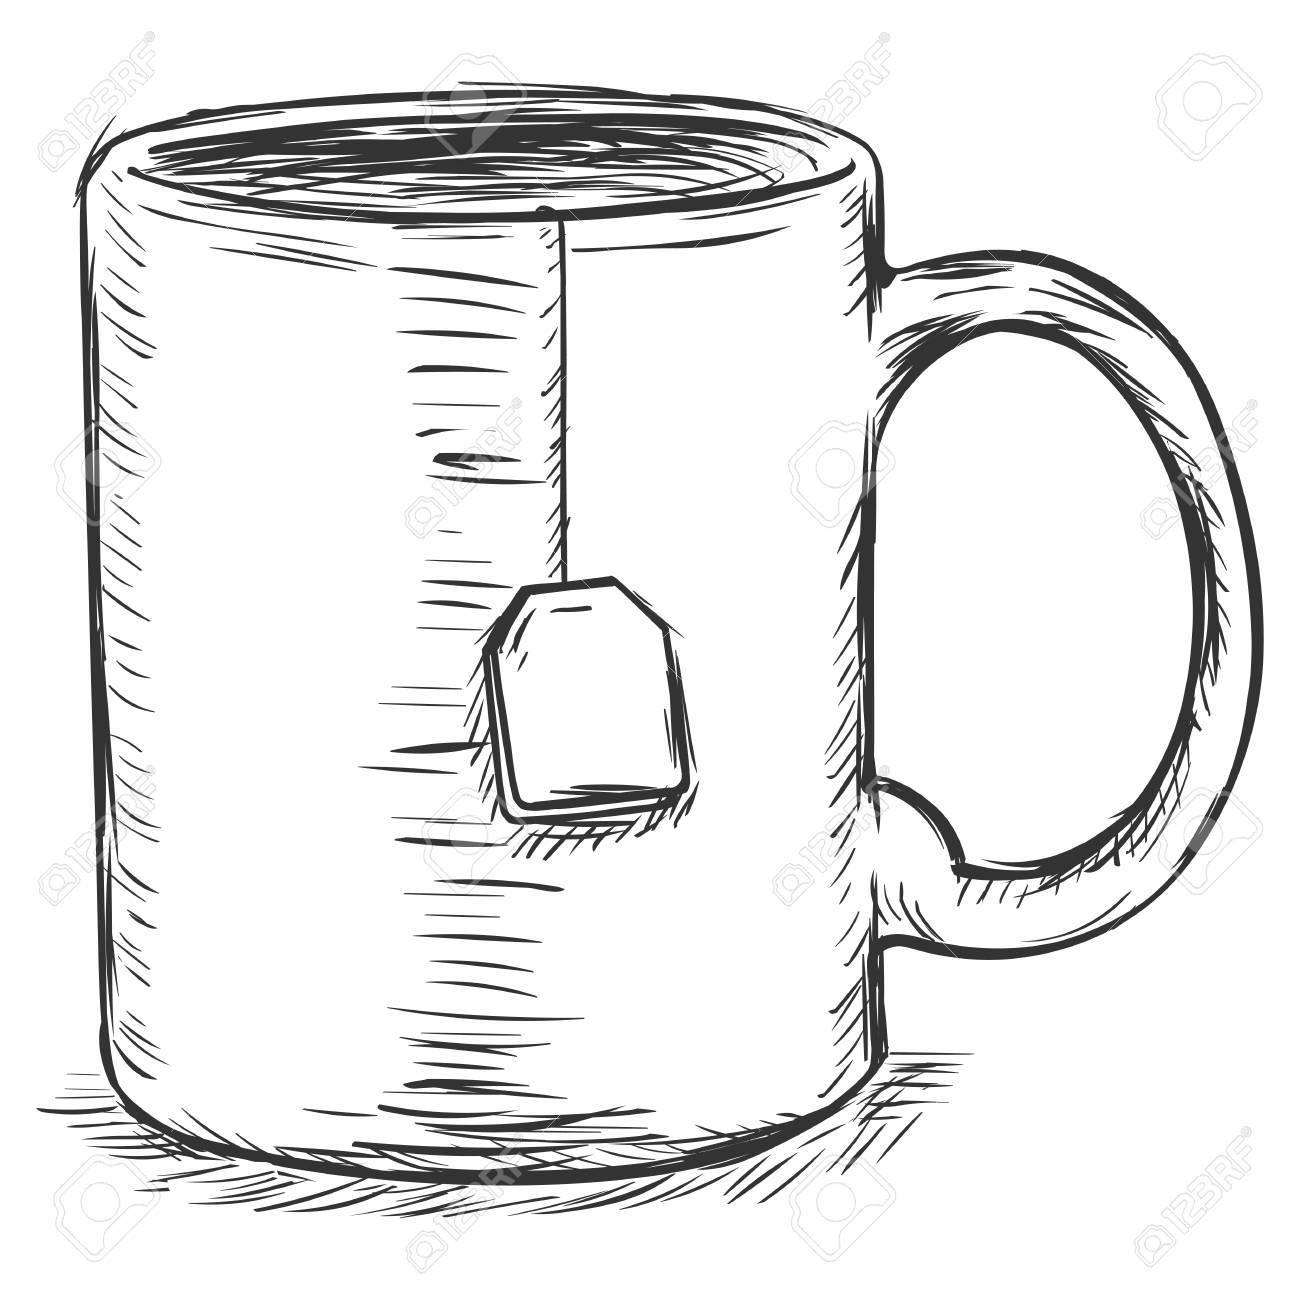 Vector Sketch Illustration Mug With Tea Bag Royalty Free Cliparts Vectors And Stock Illustration Image 62675927